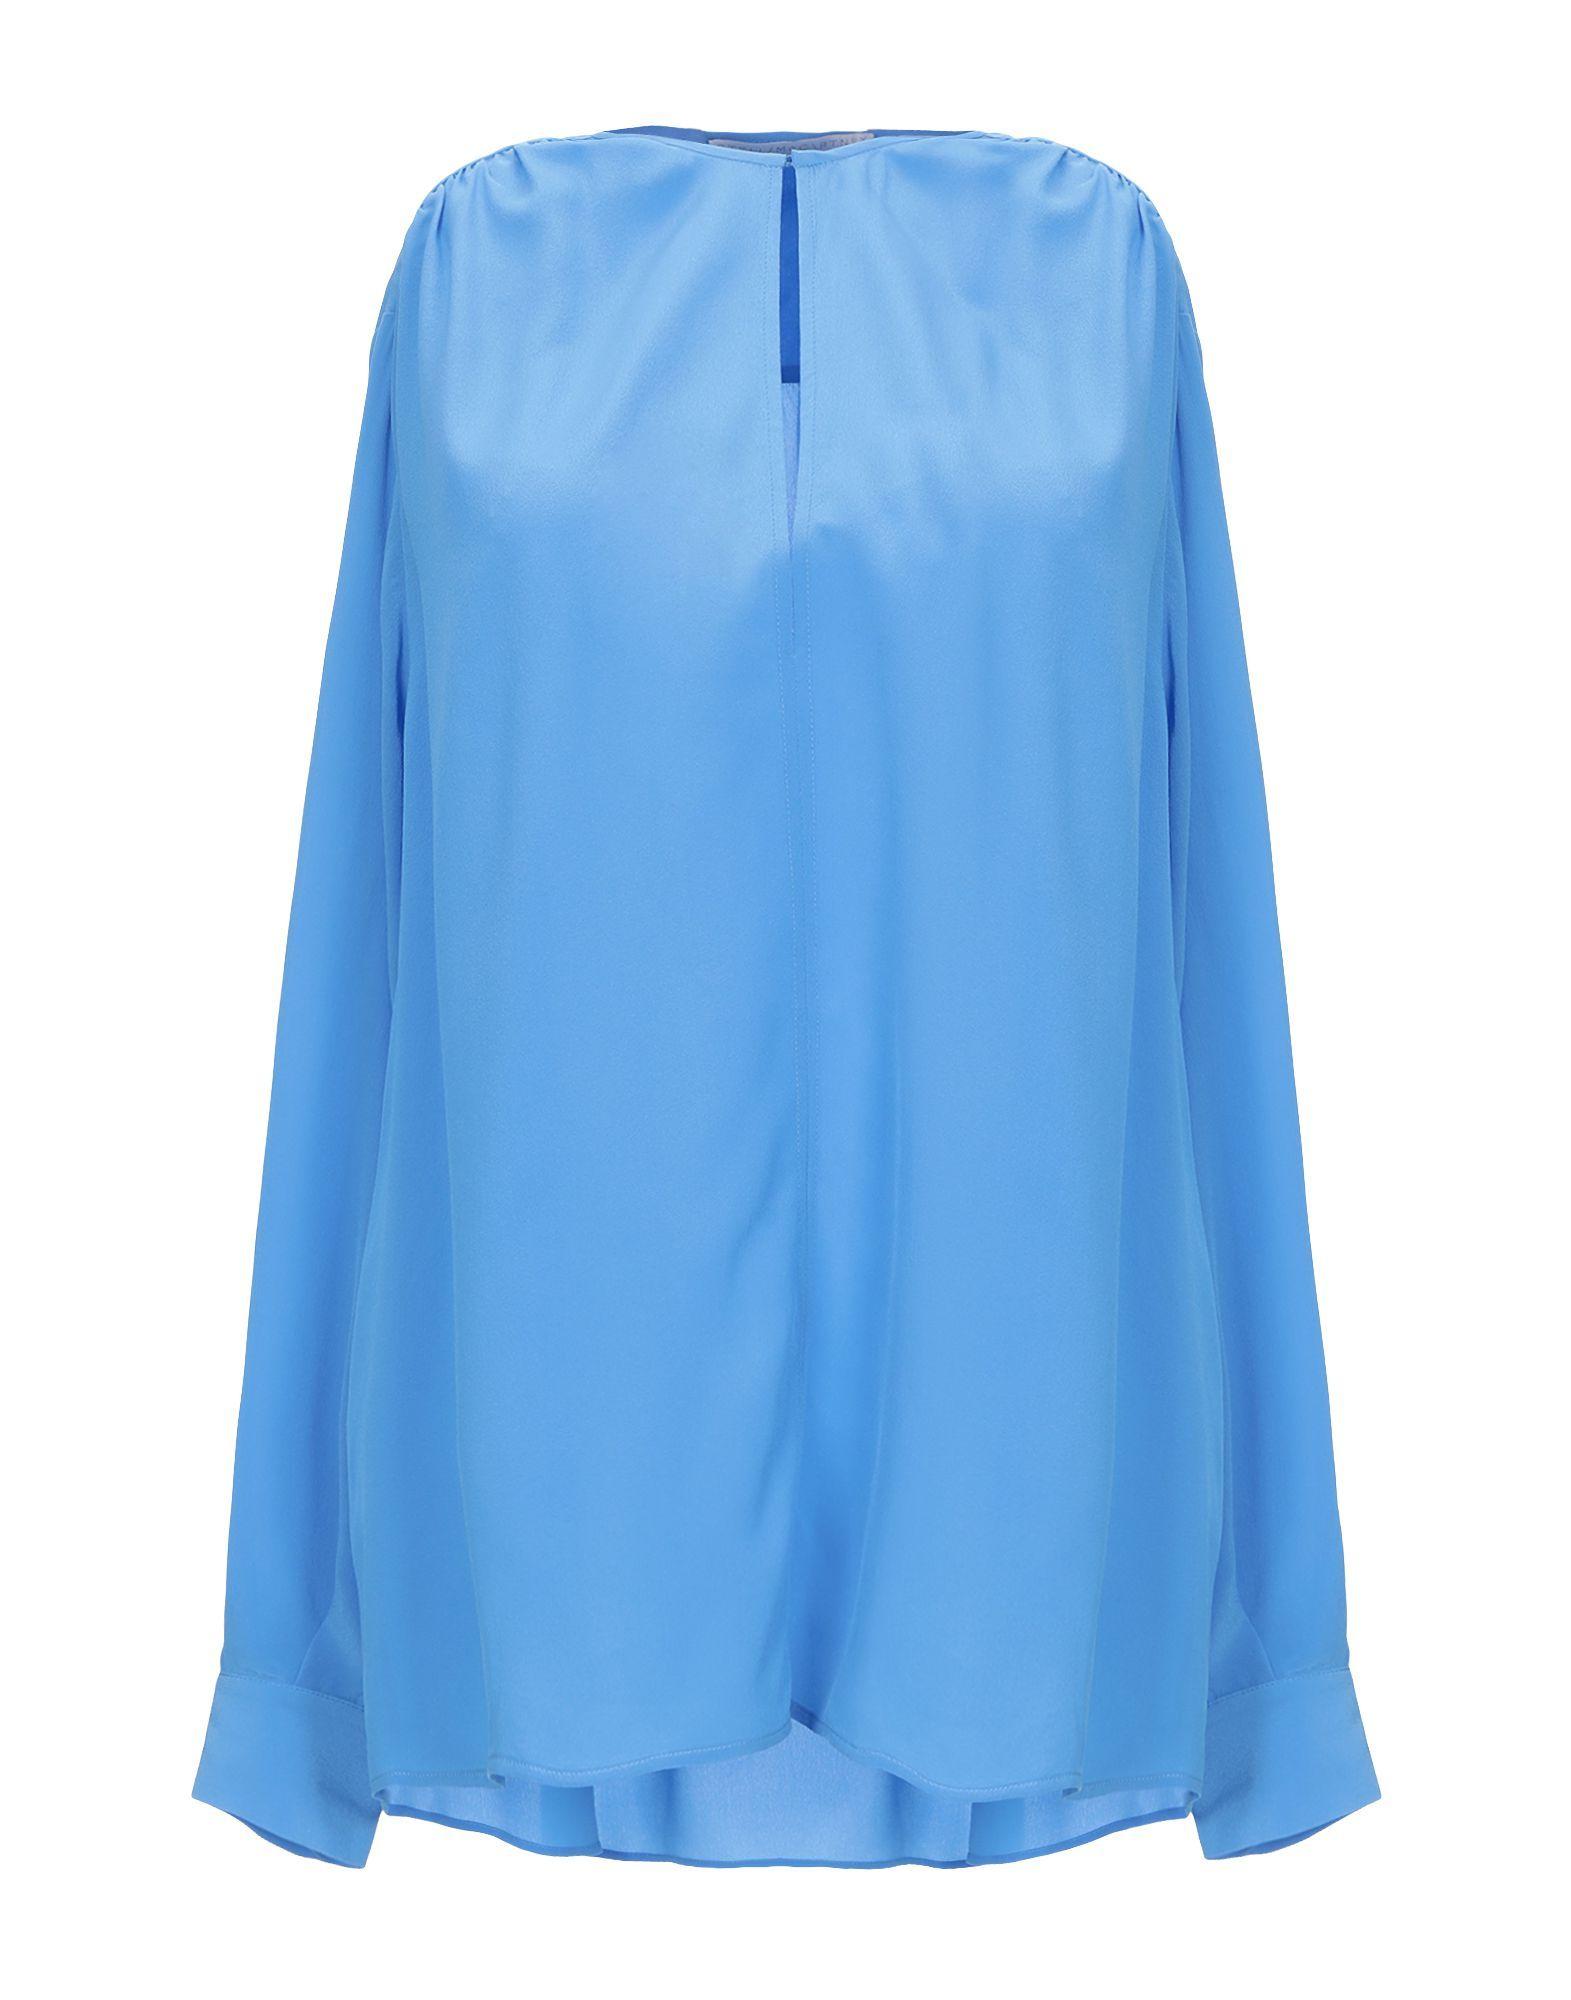 Stella McCartney Azure Silk Blouse